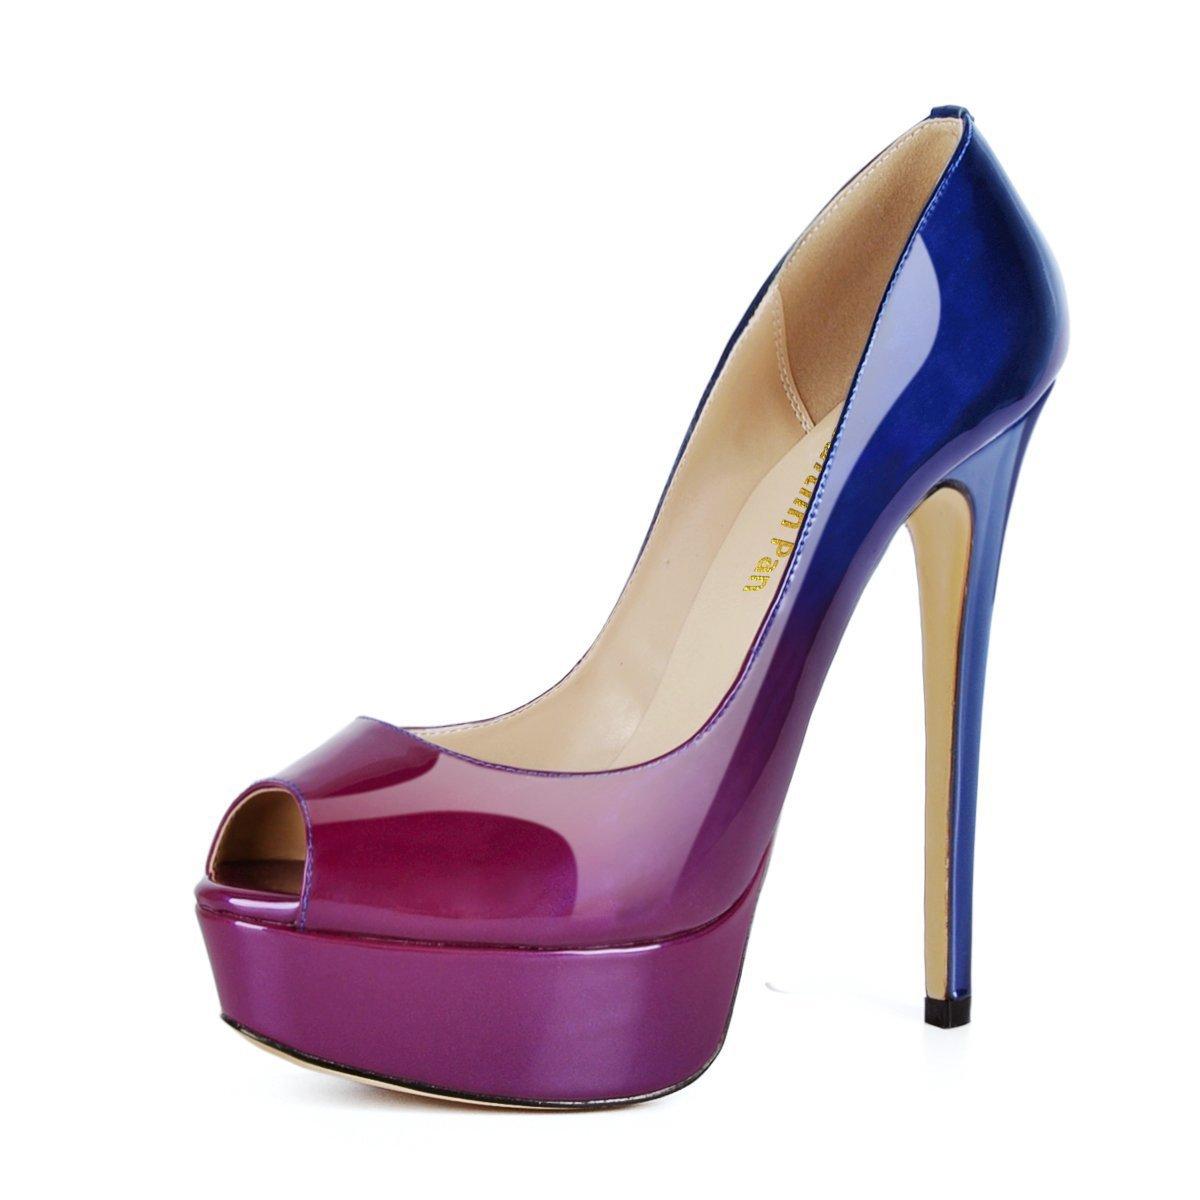 Caitlin Pan Femmes Escarpins Plateforme Peep 15CM Escarpins Peep 15CM Toe 19371 3CM Plateforme Talon Chaussures Open Toe 35-45 Blue-purple/Fond R0uge 2e3aa41 - deadsea.space